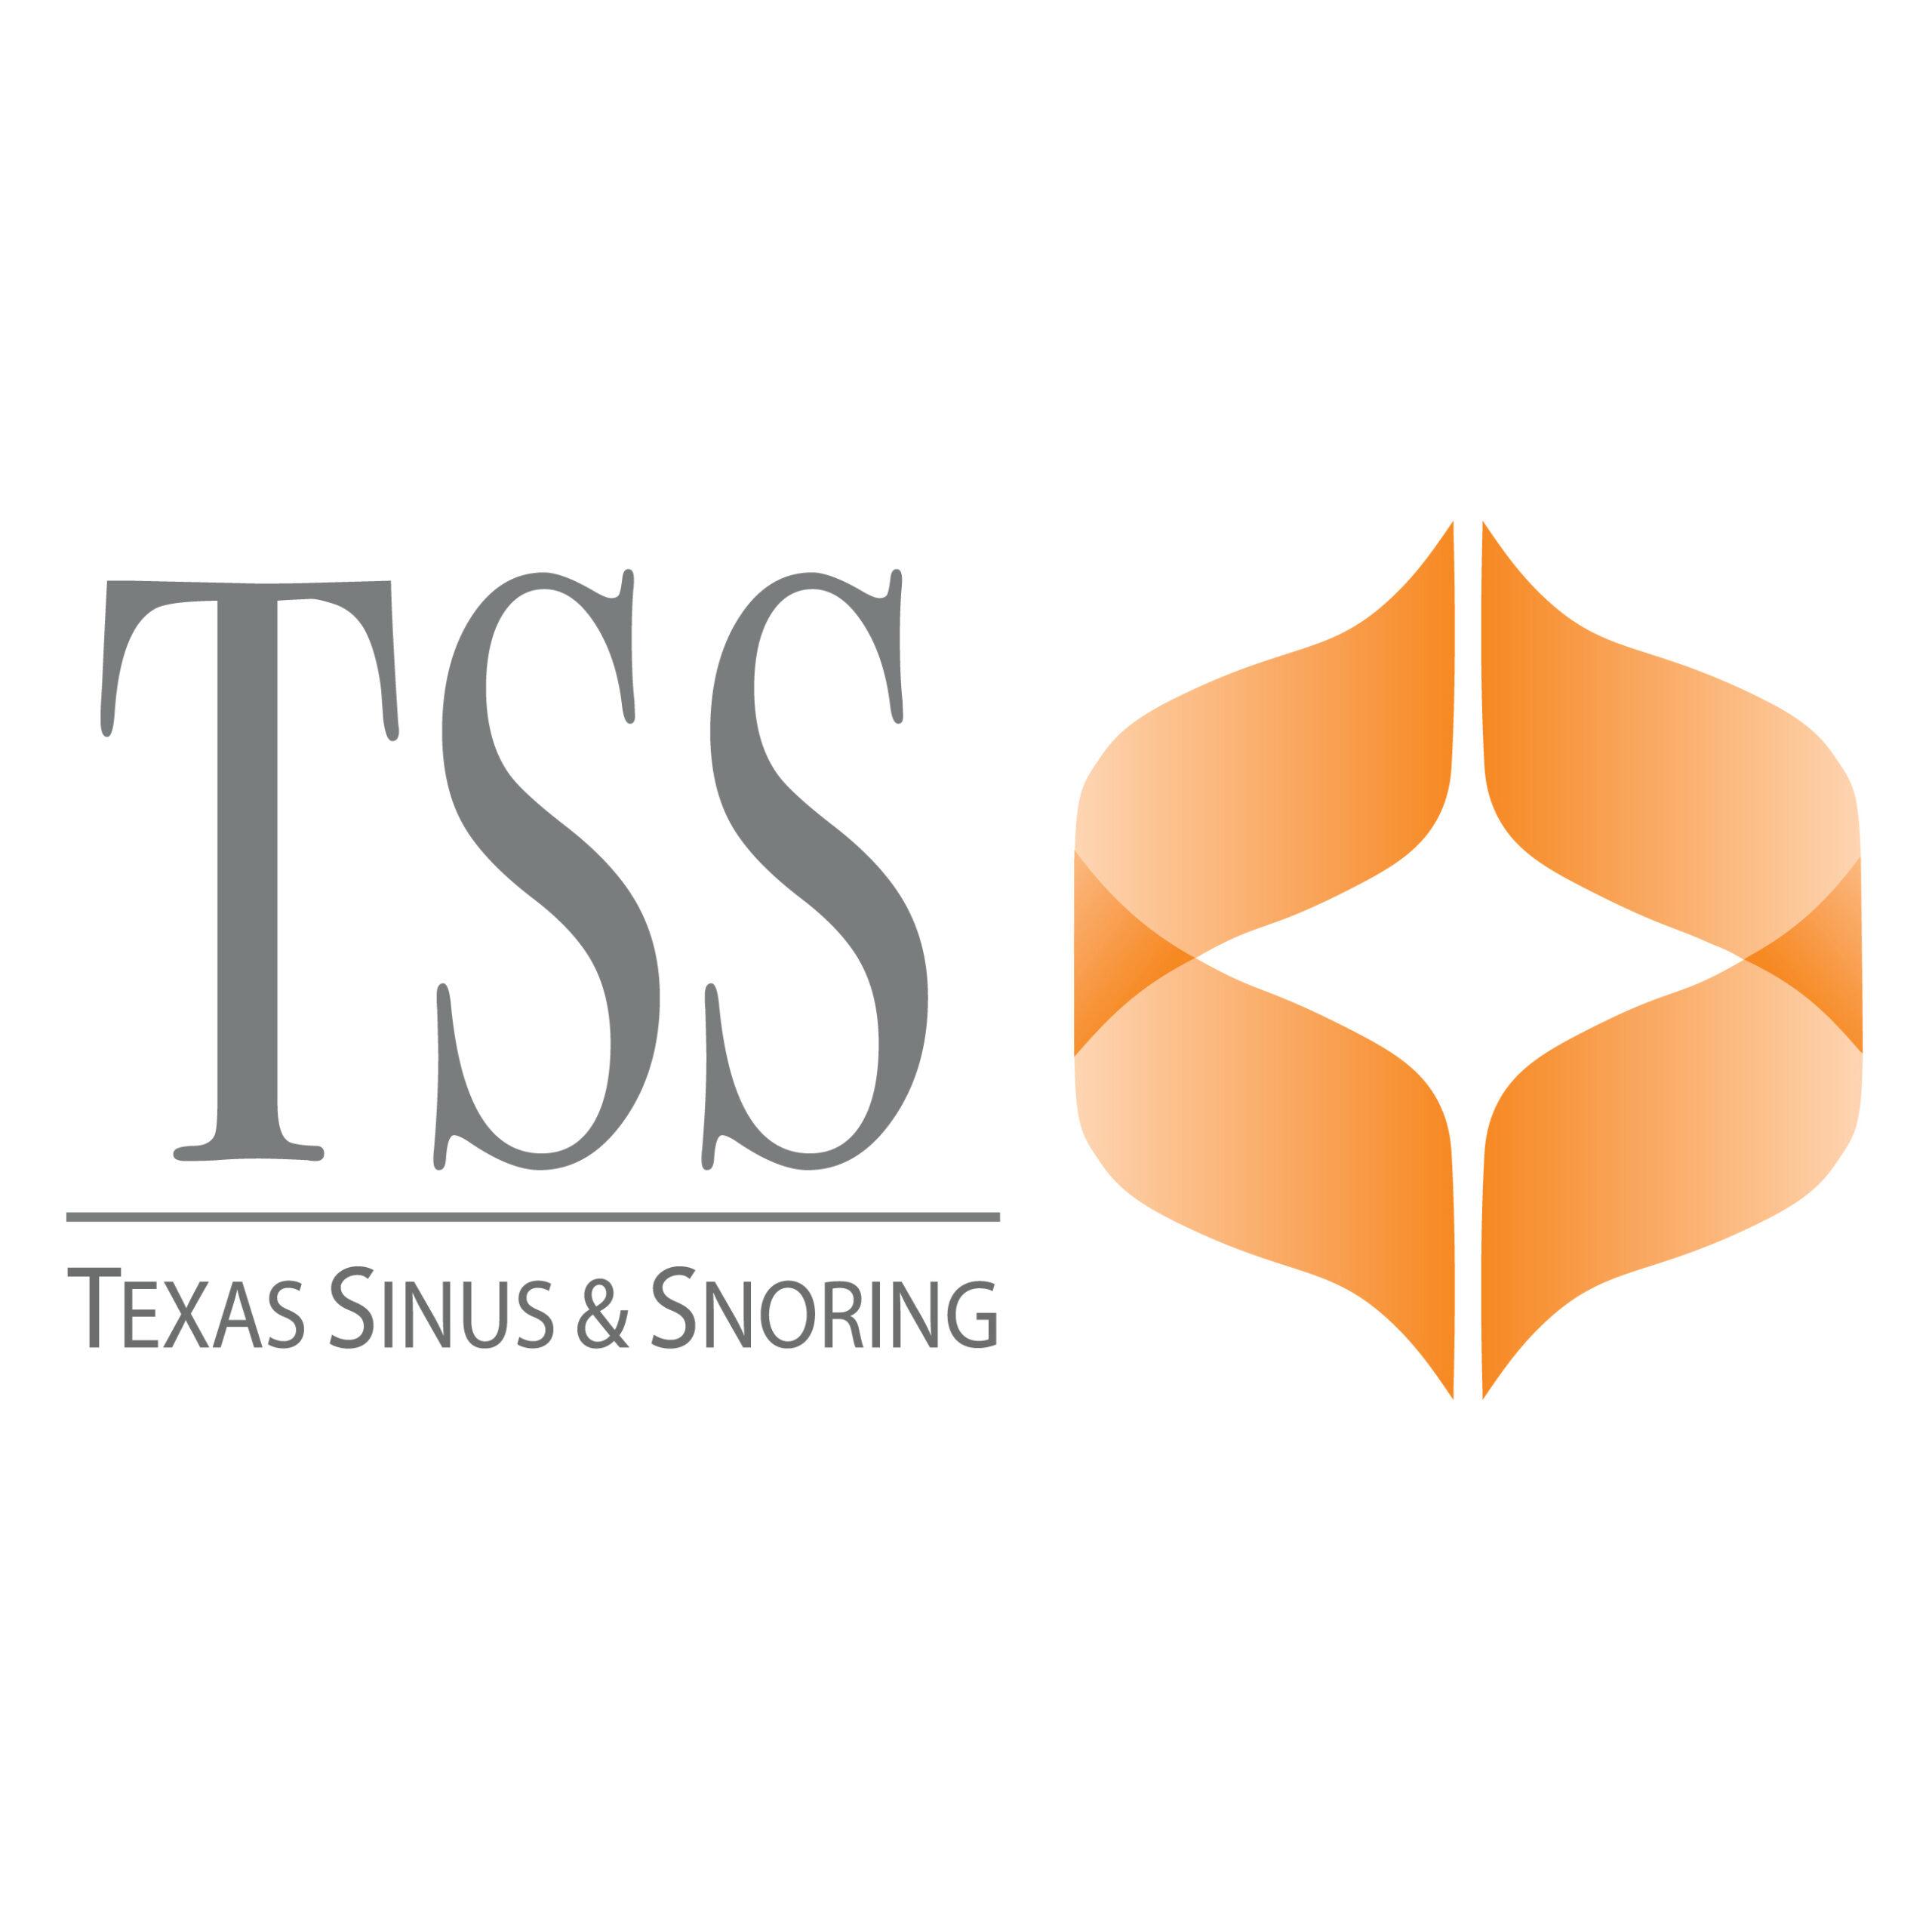 Texas Sinus and Snoring